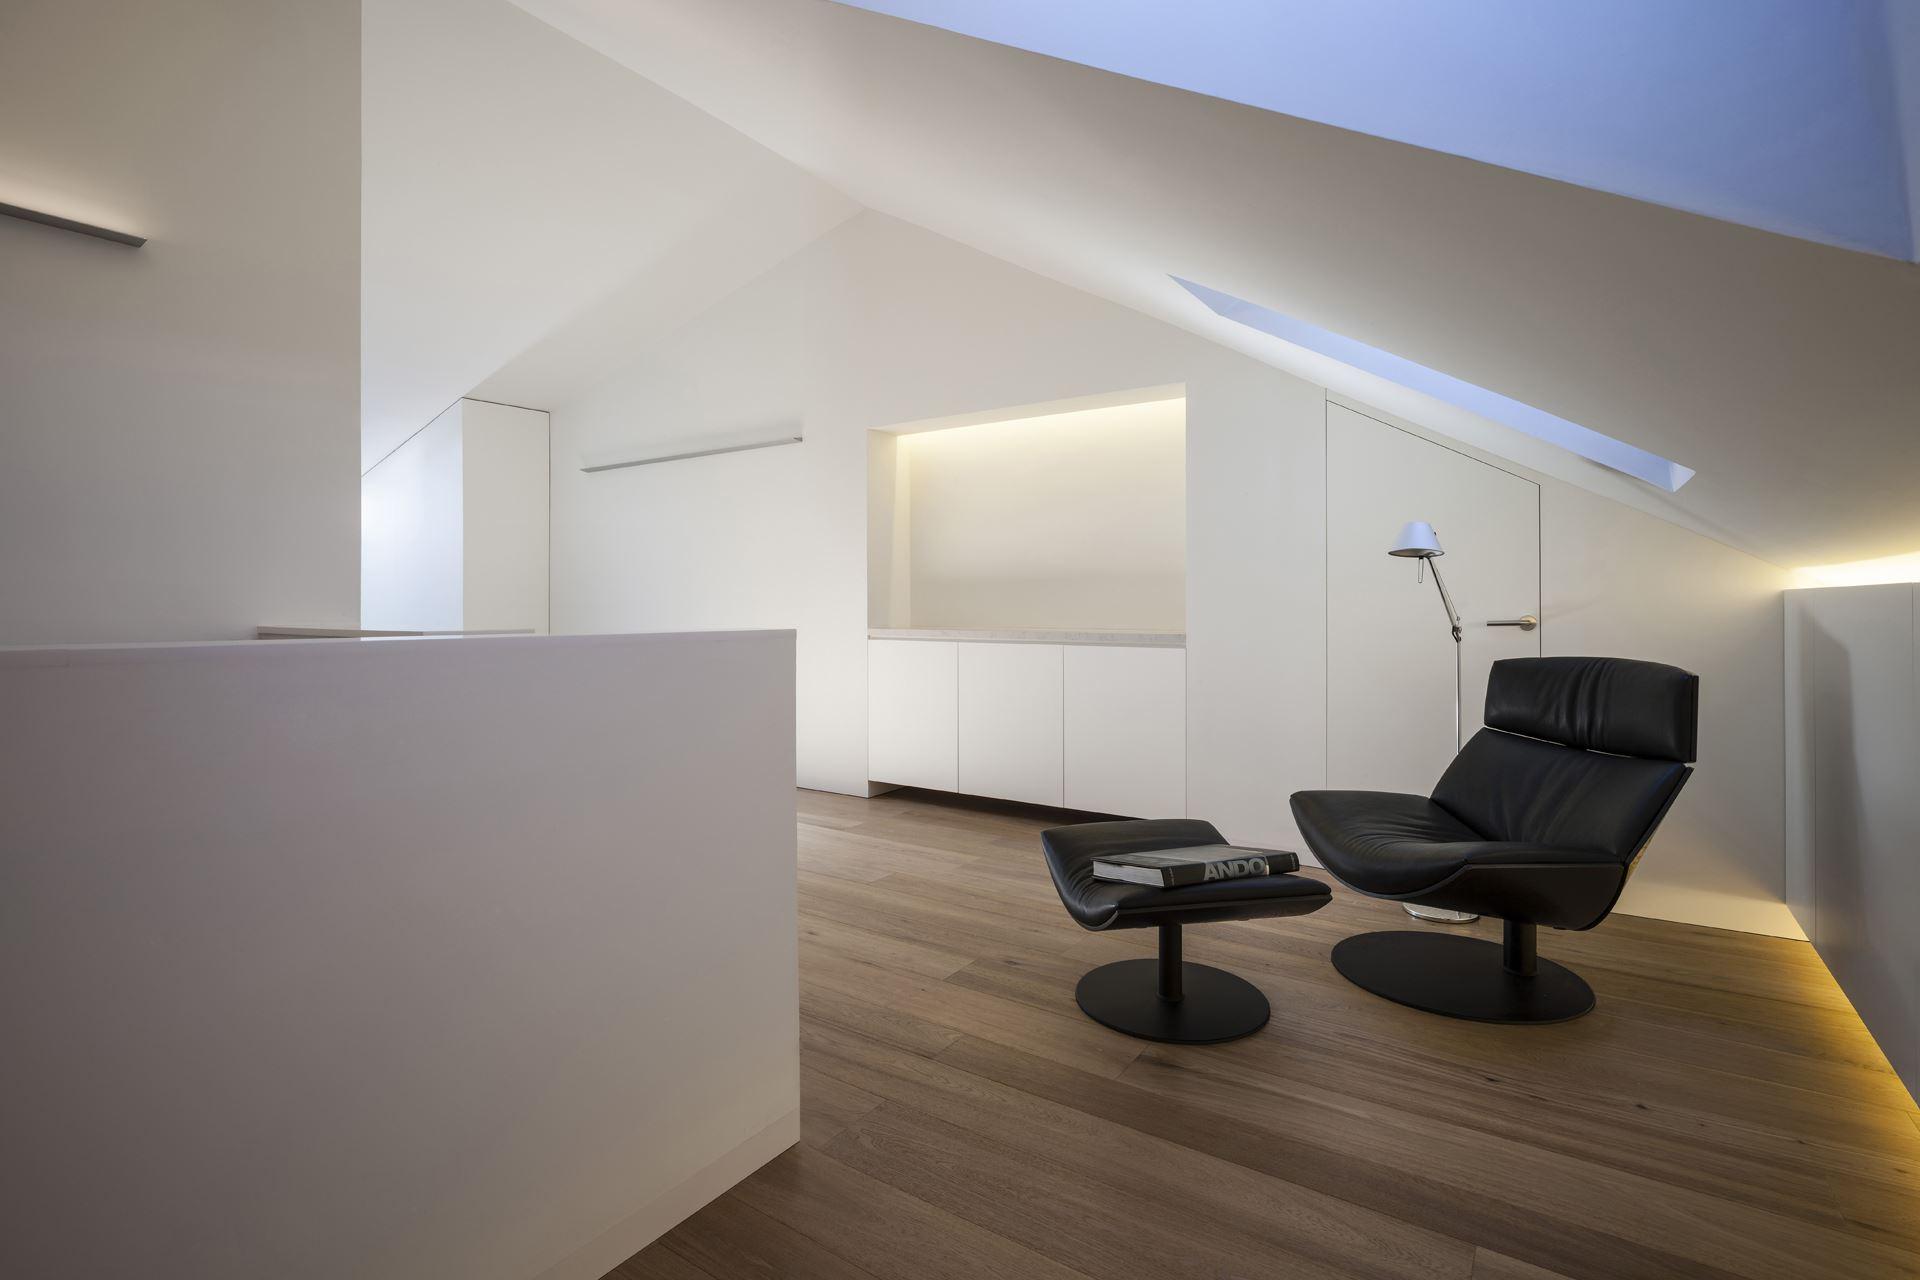 Modern Interior - Gallardo Llopis Architects